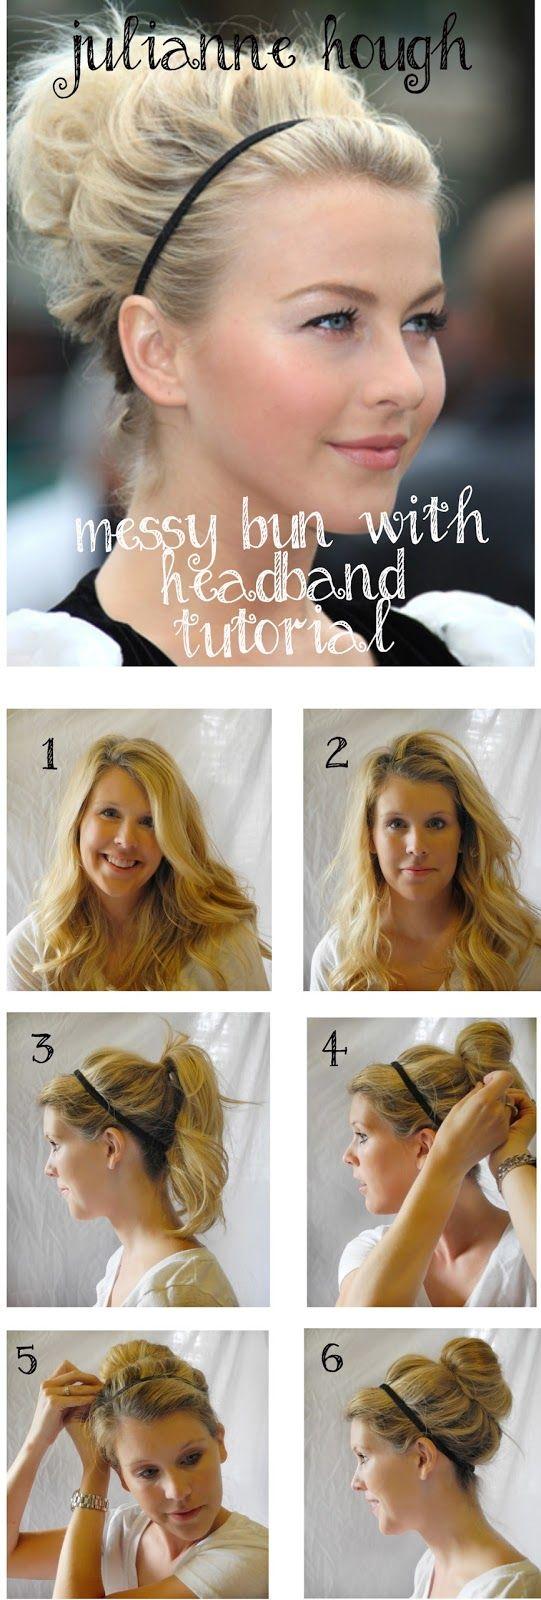 Three Sweet Peas...: Channelling Julianne Hough - hair tutorial